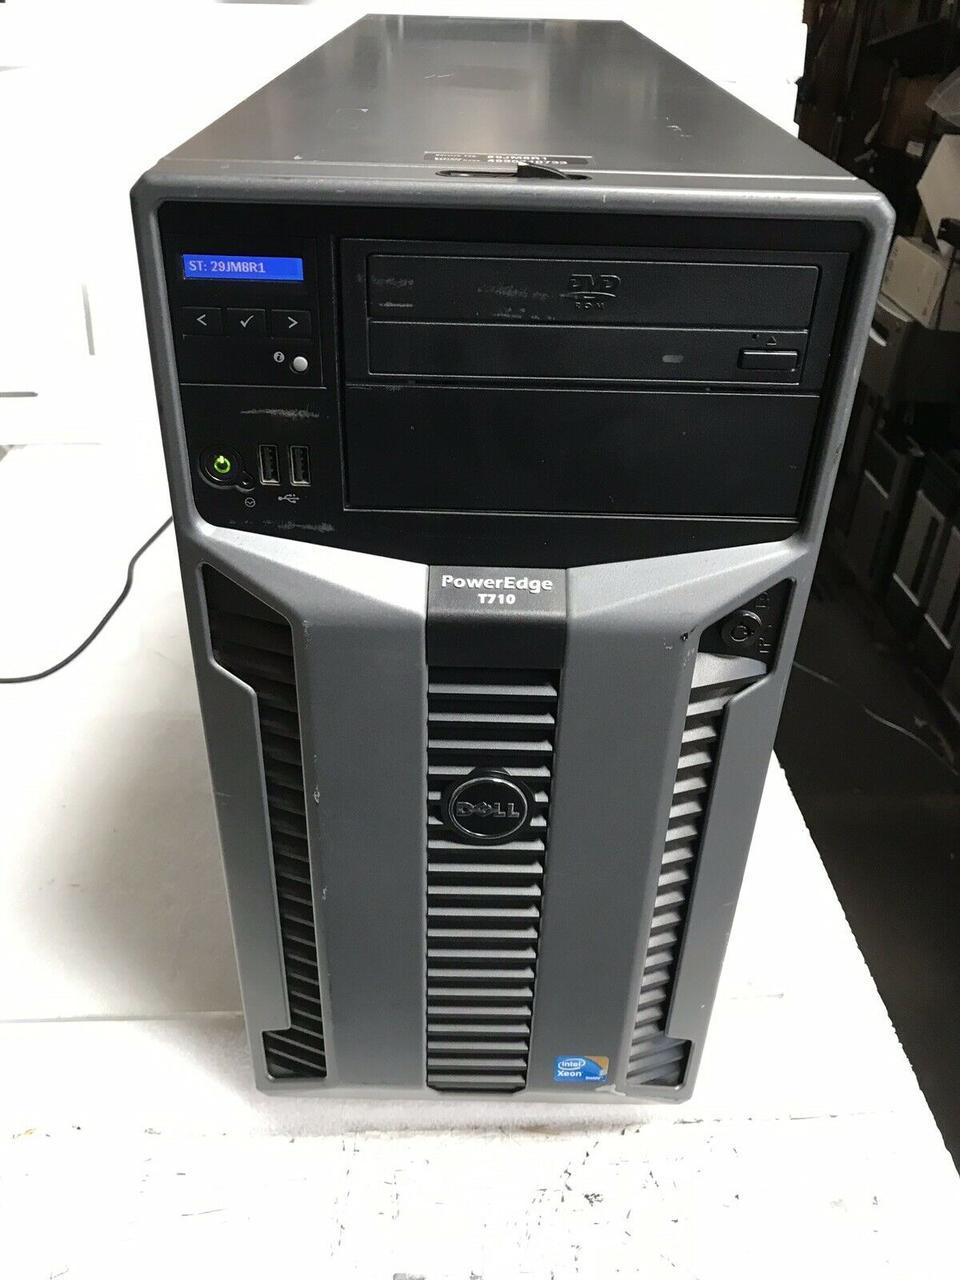 Сервер, Workstation, Dell T710, Intel Xeon X5550, 4 ядра по 2,66 GHz, 16 Гб ОЗУ, HDD 0 Гб, видео 1 Гб, 1100W